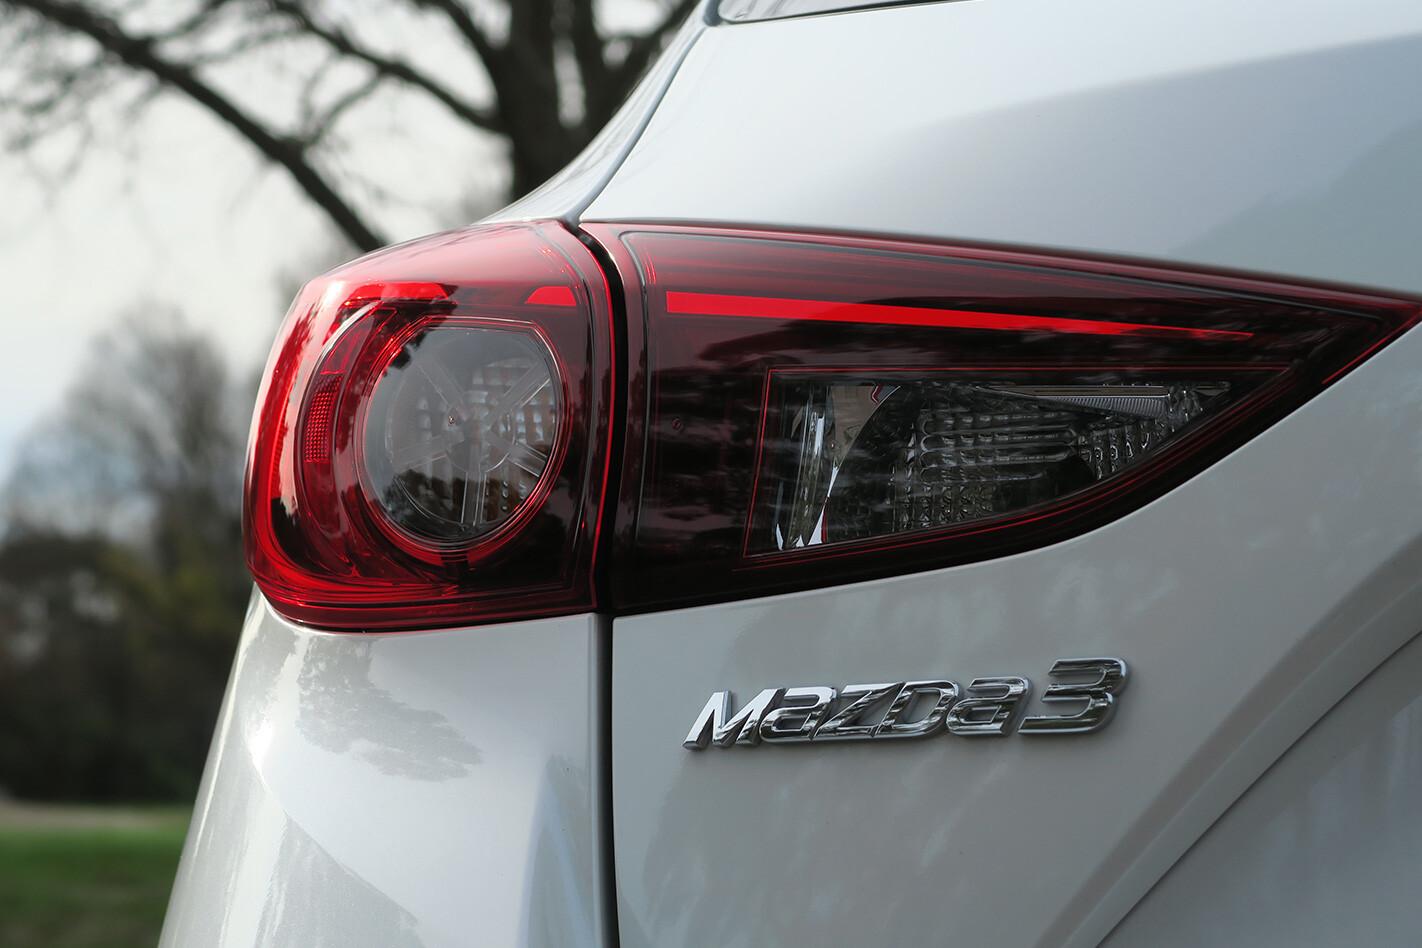 Mazda 3 Badgee Jpg